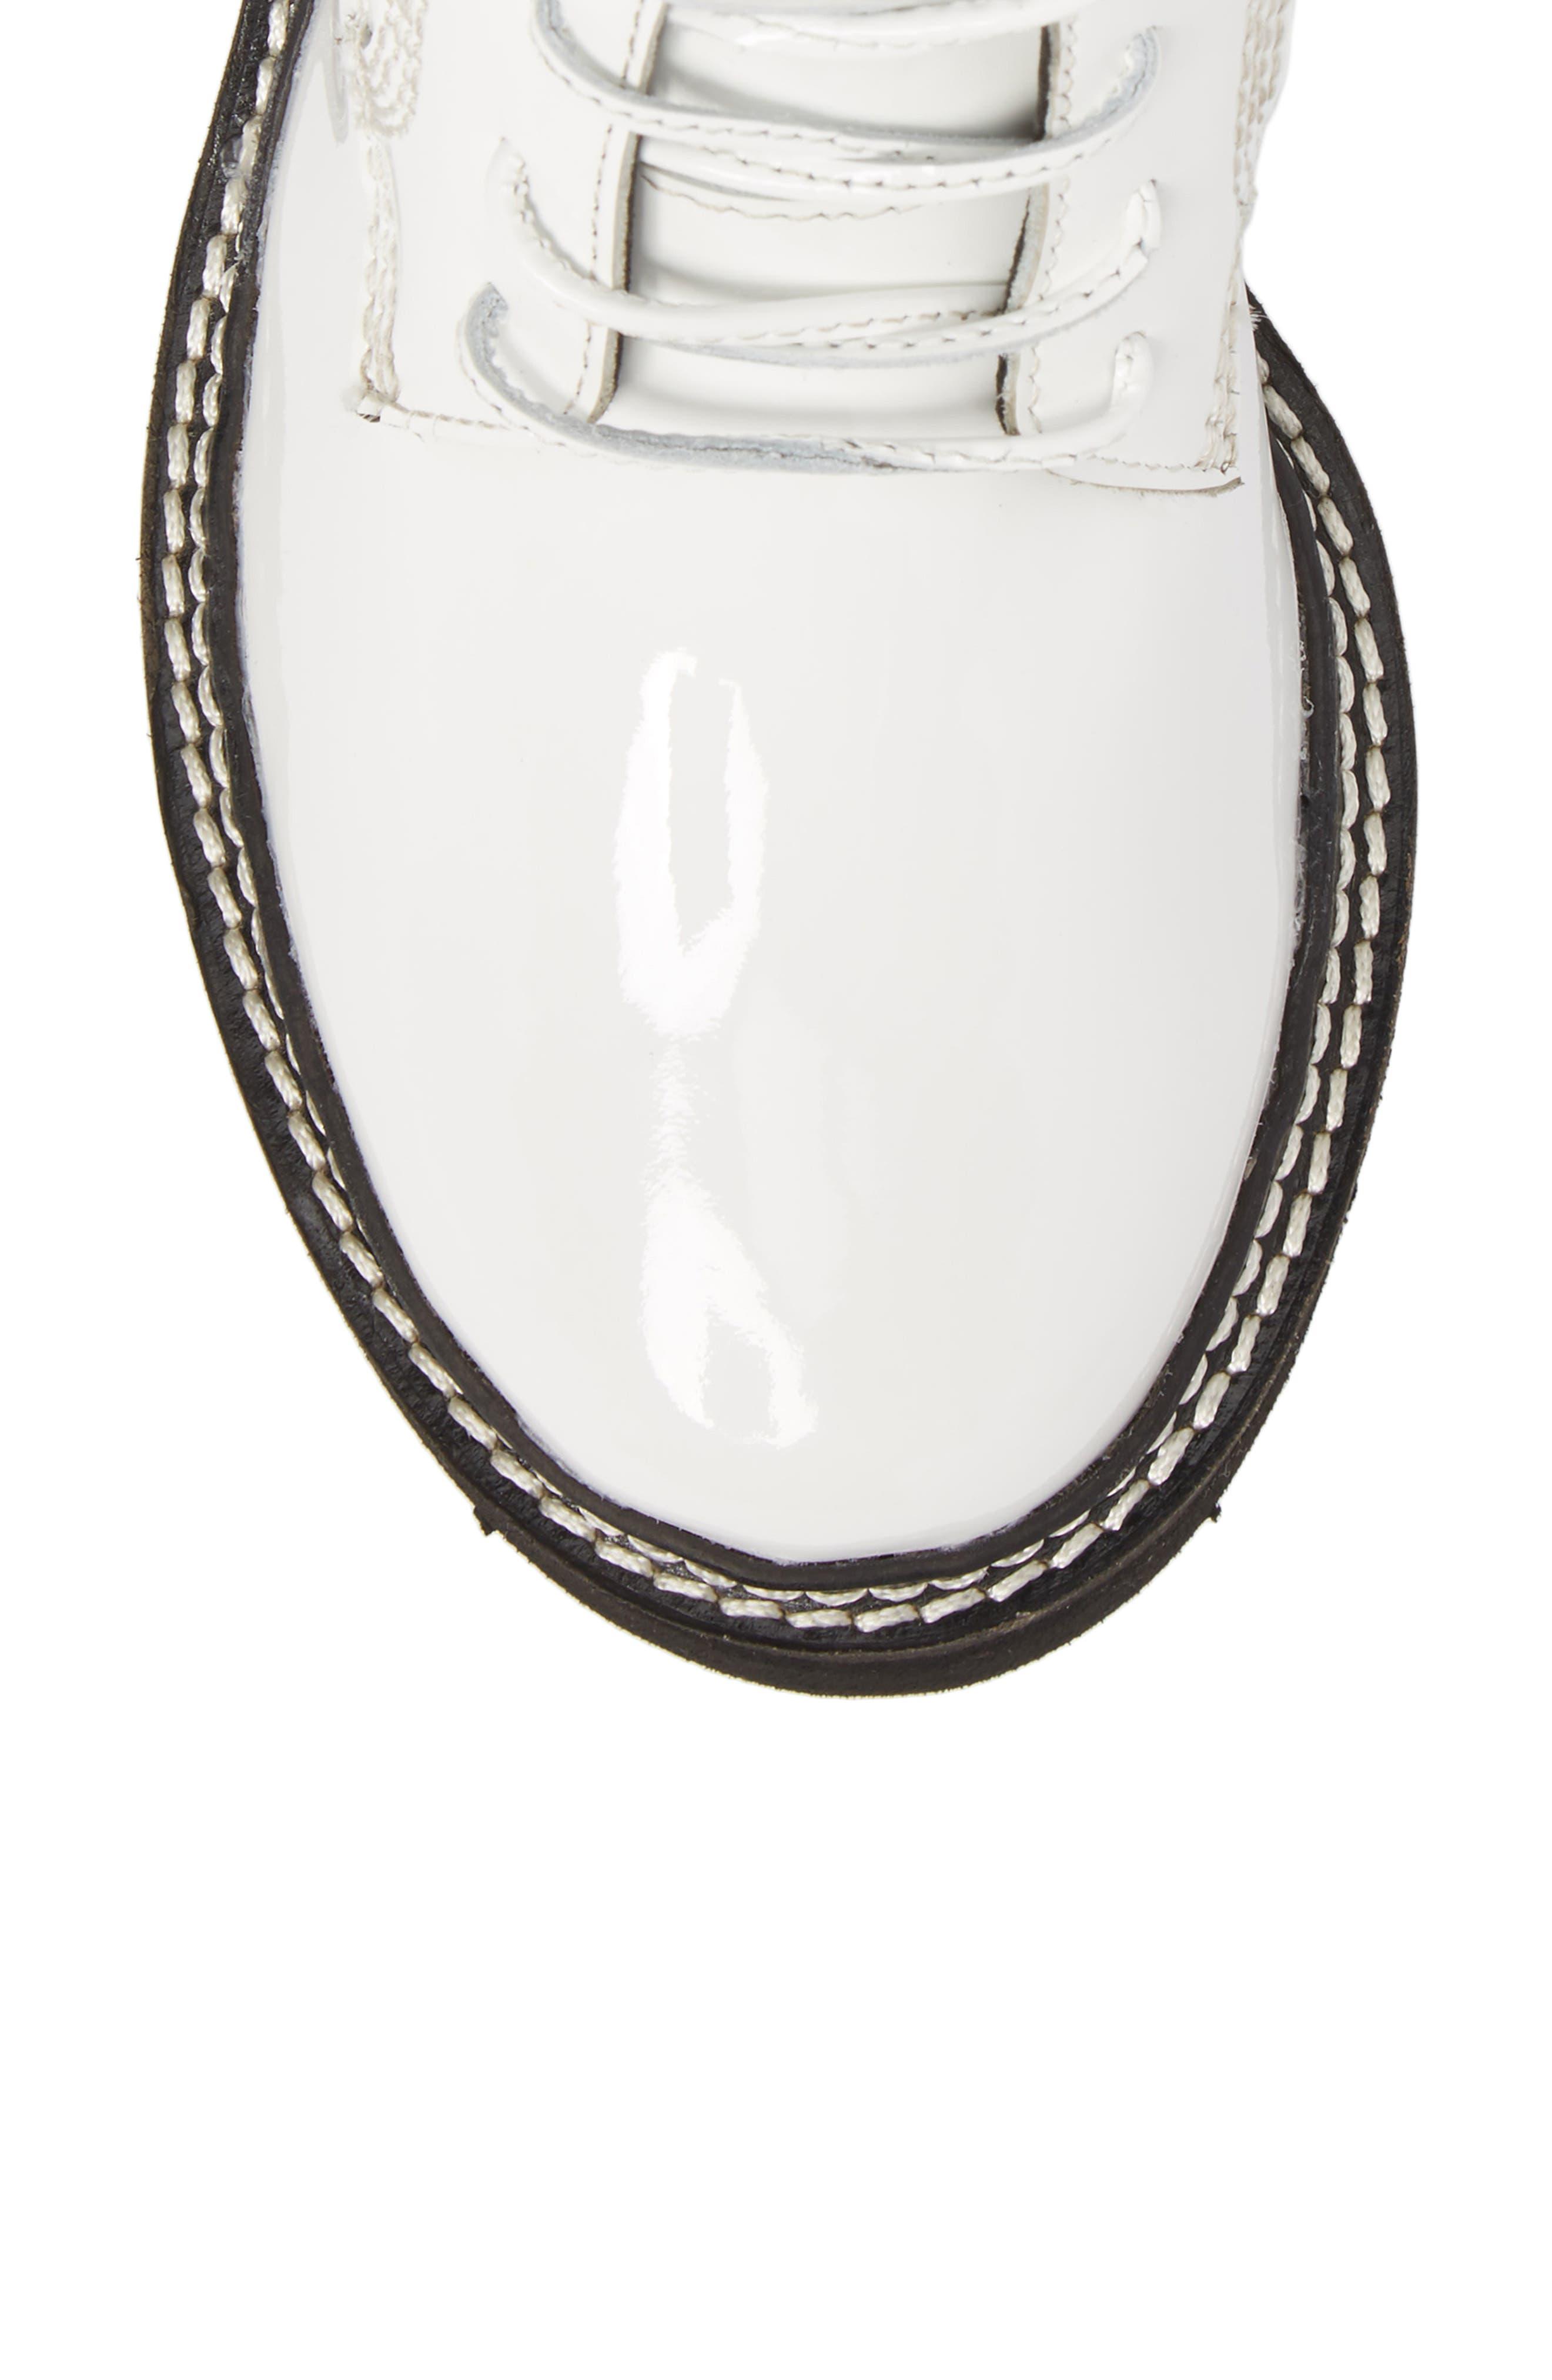 Agira Lug Boot,                             Alternate thumbnail 5, color,                             White Patent Leather